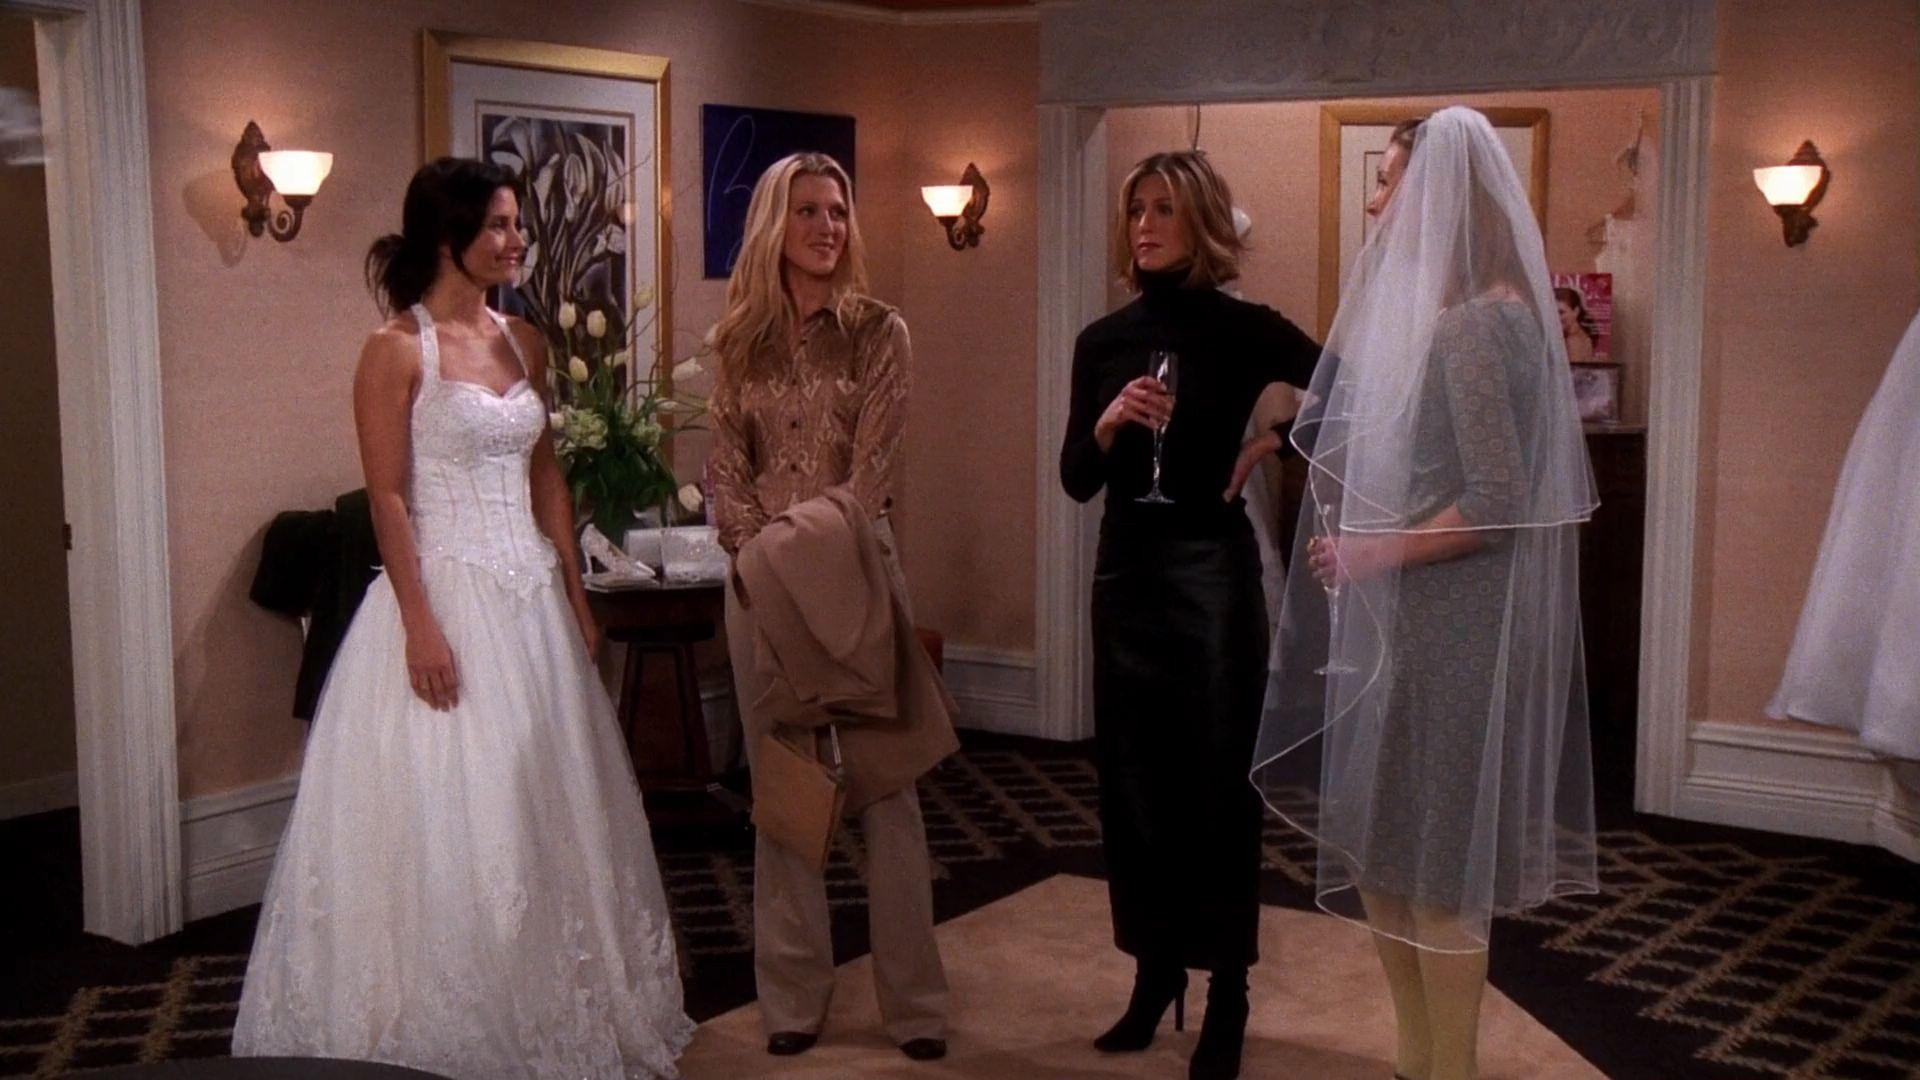 Monica Megan Rachel And Phoebe Friends 7x17 The One With A Cheap Wedding Dress Cheap Wedding Dress Wedding Dresses Wedding Dresses Lace [ 1080 x 1920 Pixel ]